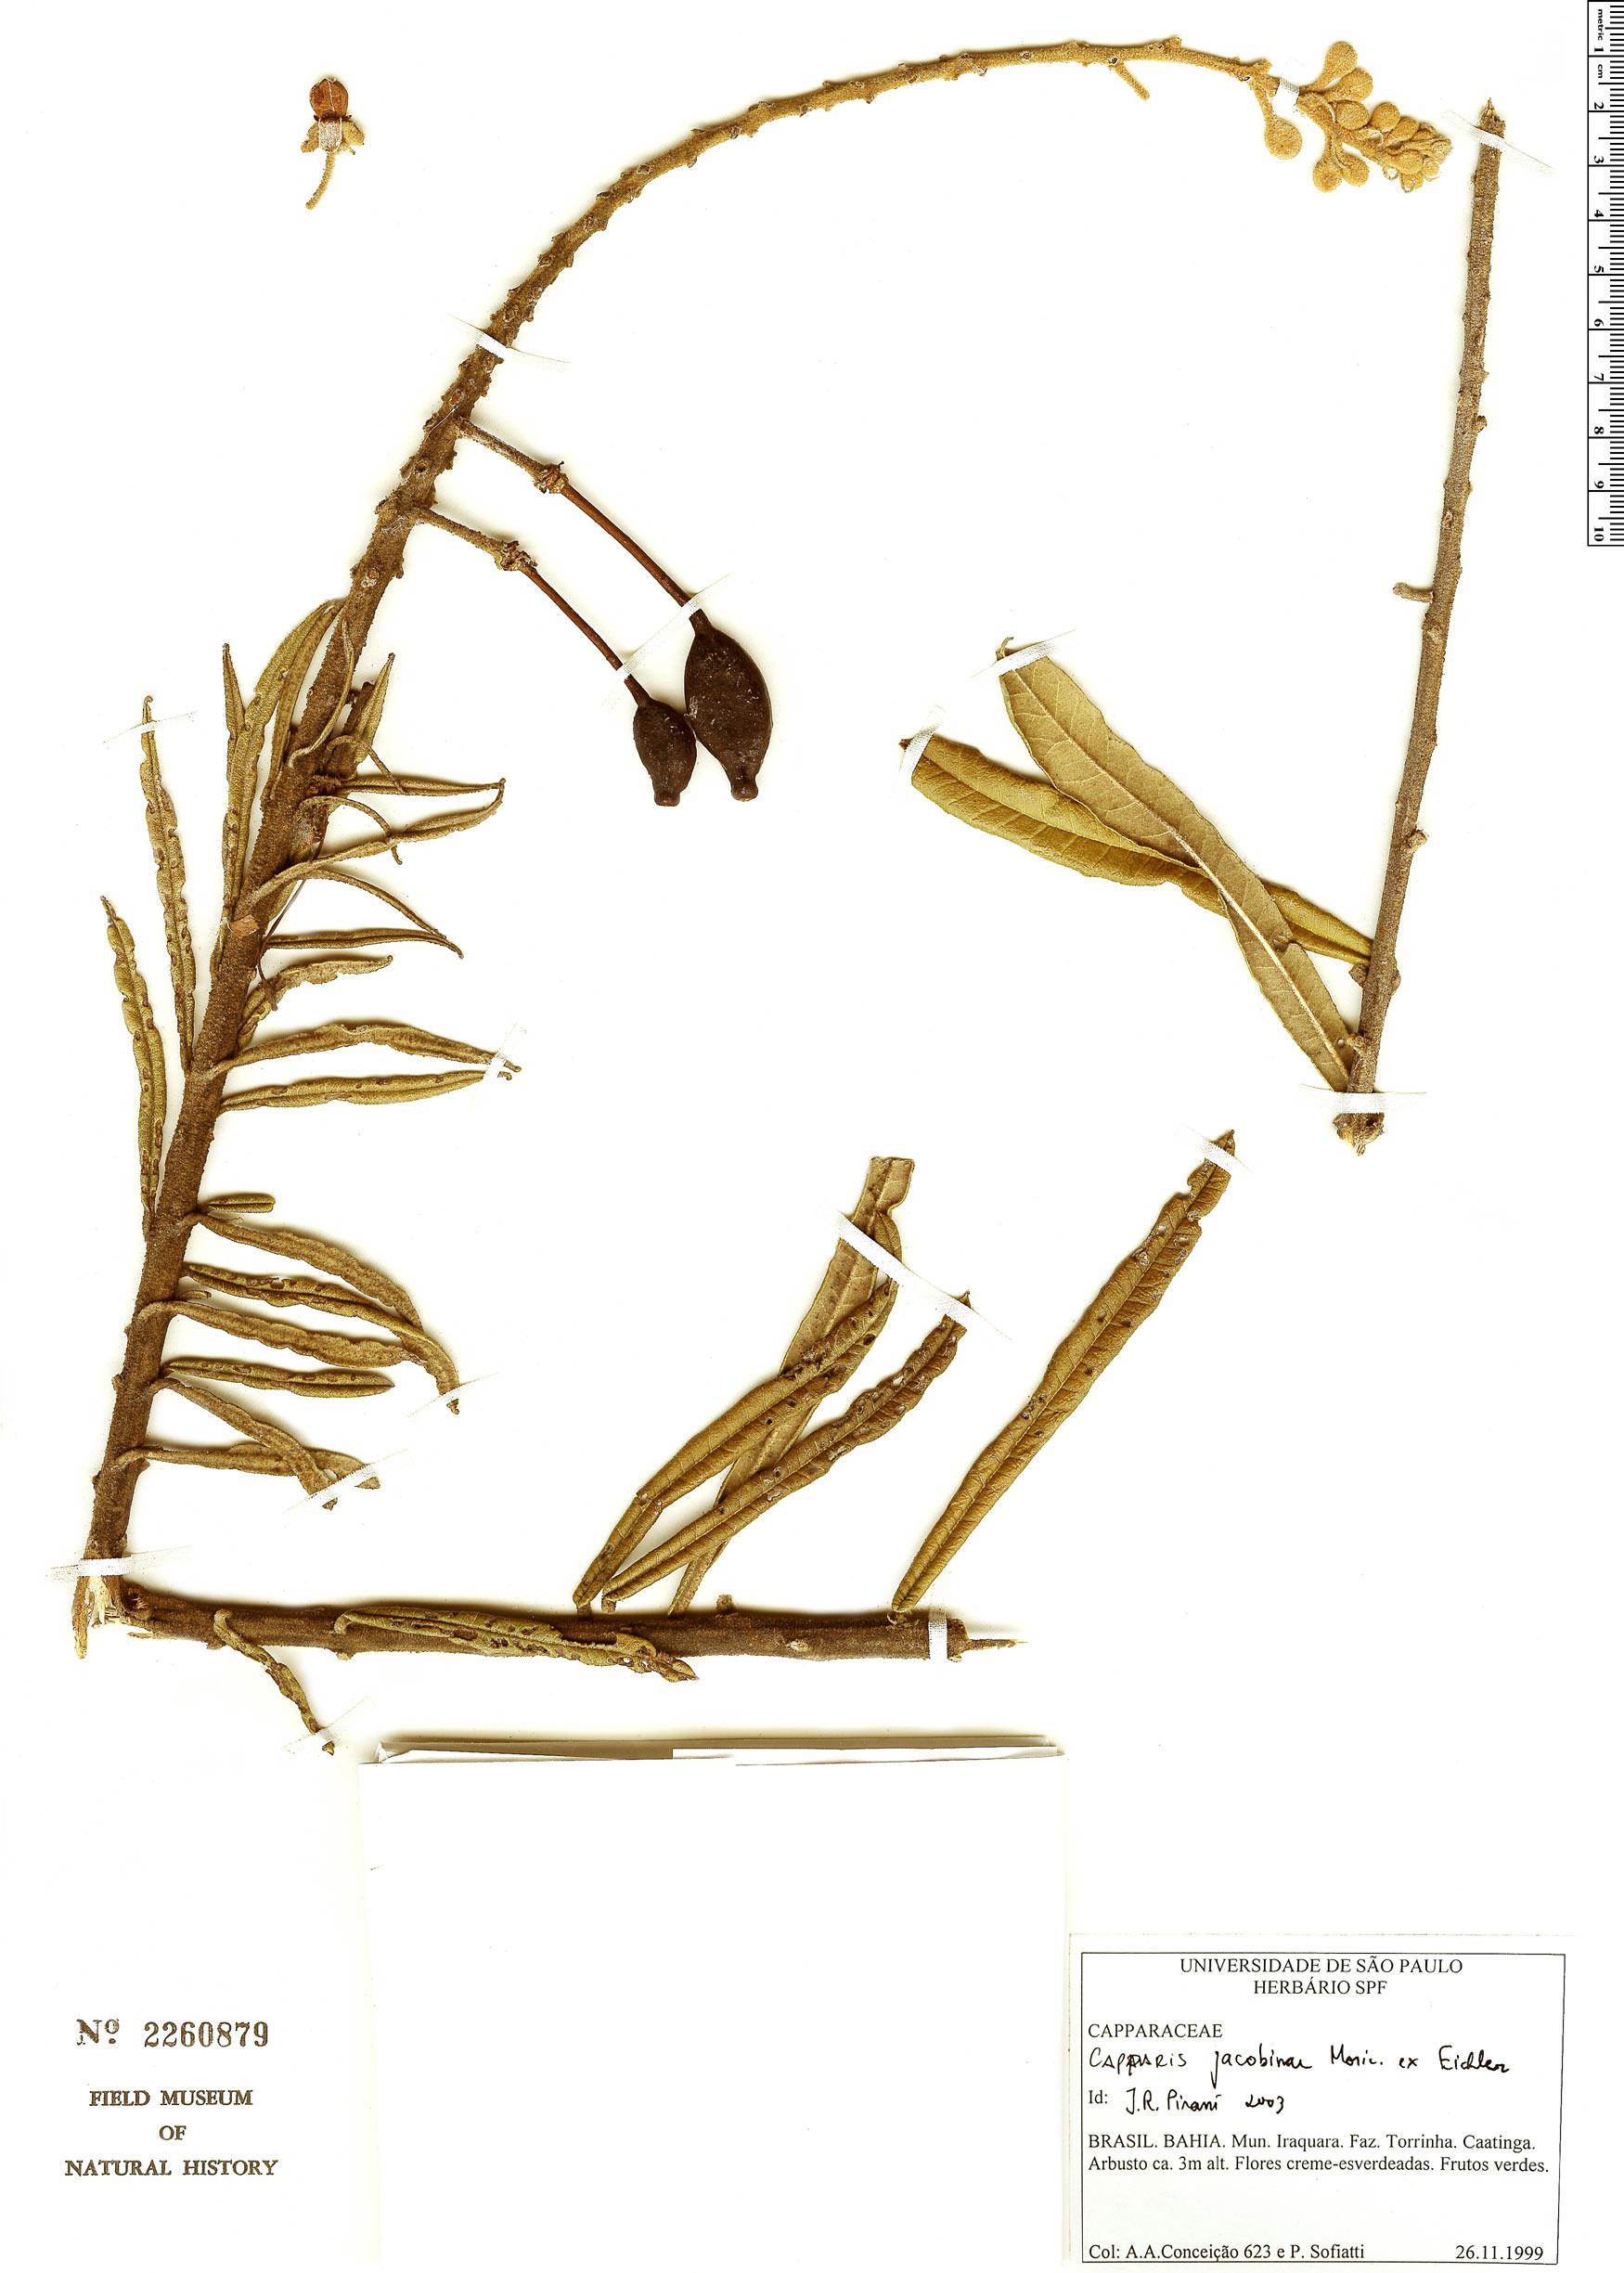 Specimen: Neocalyptrocalyx longifolium